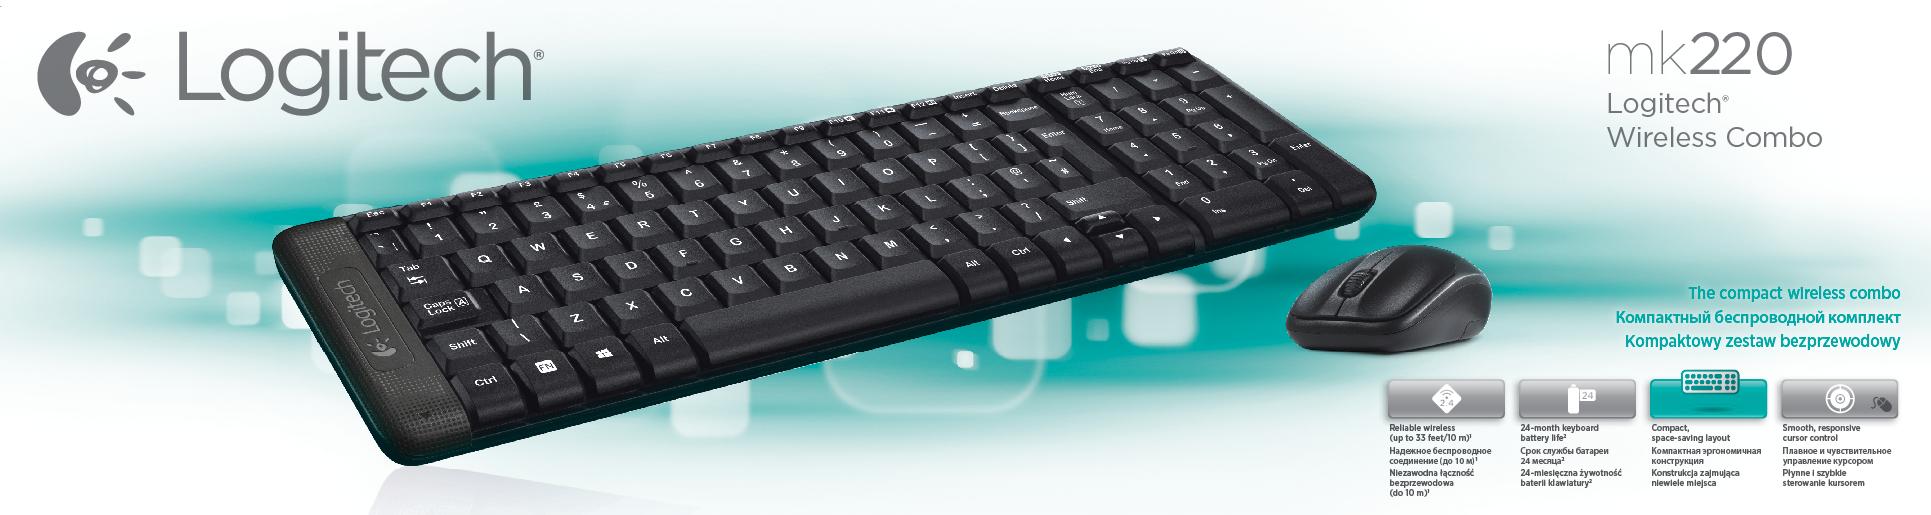 Logitech G MK220 keyboard RF Wireless QWERTY US International Black